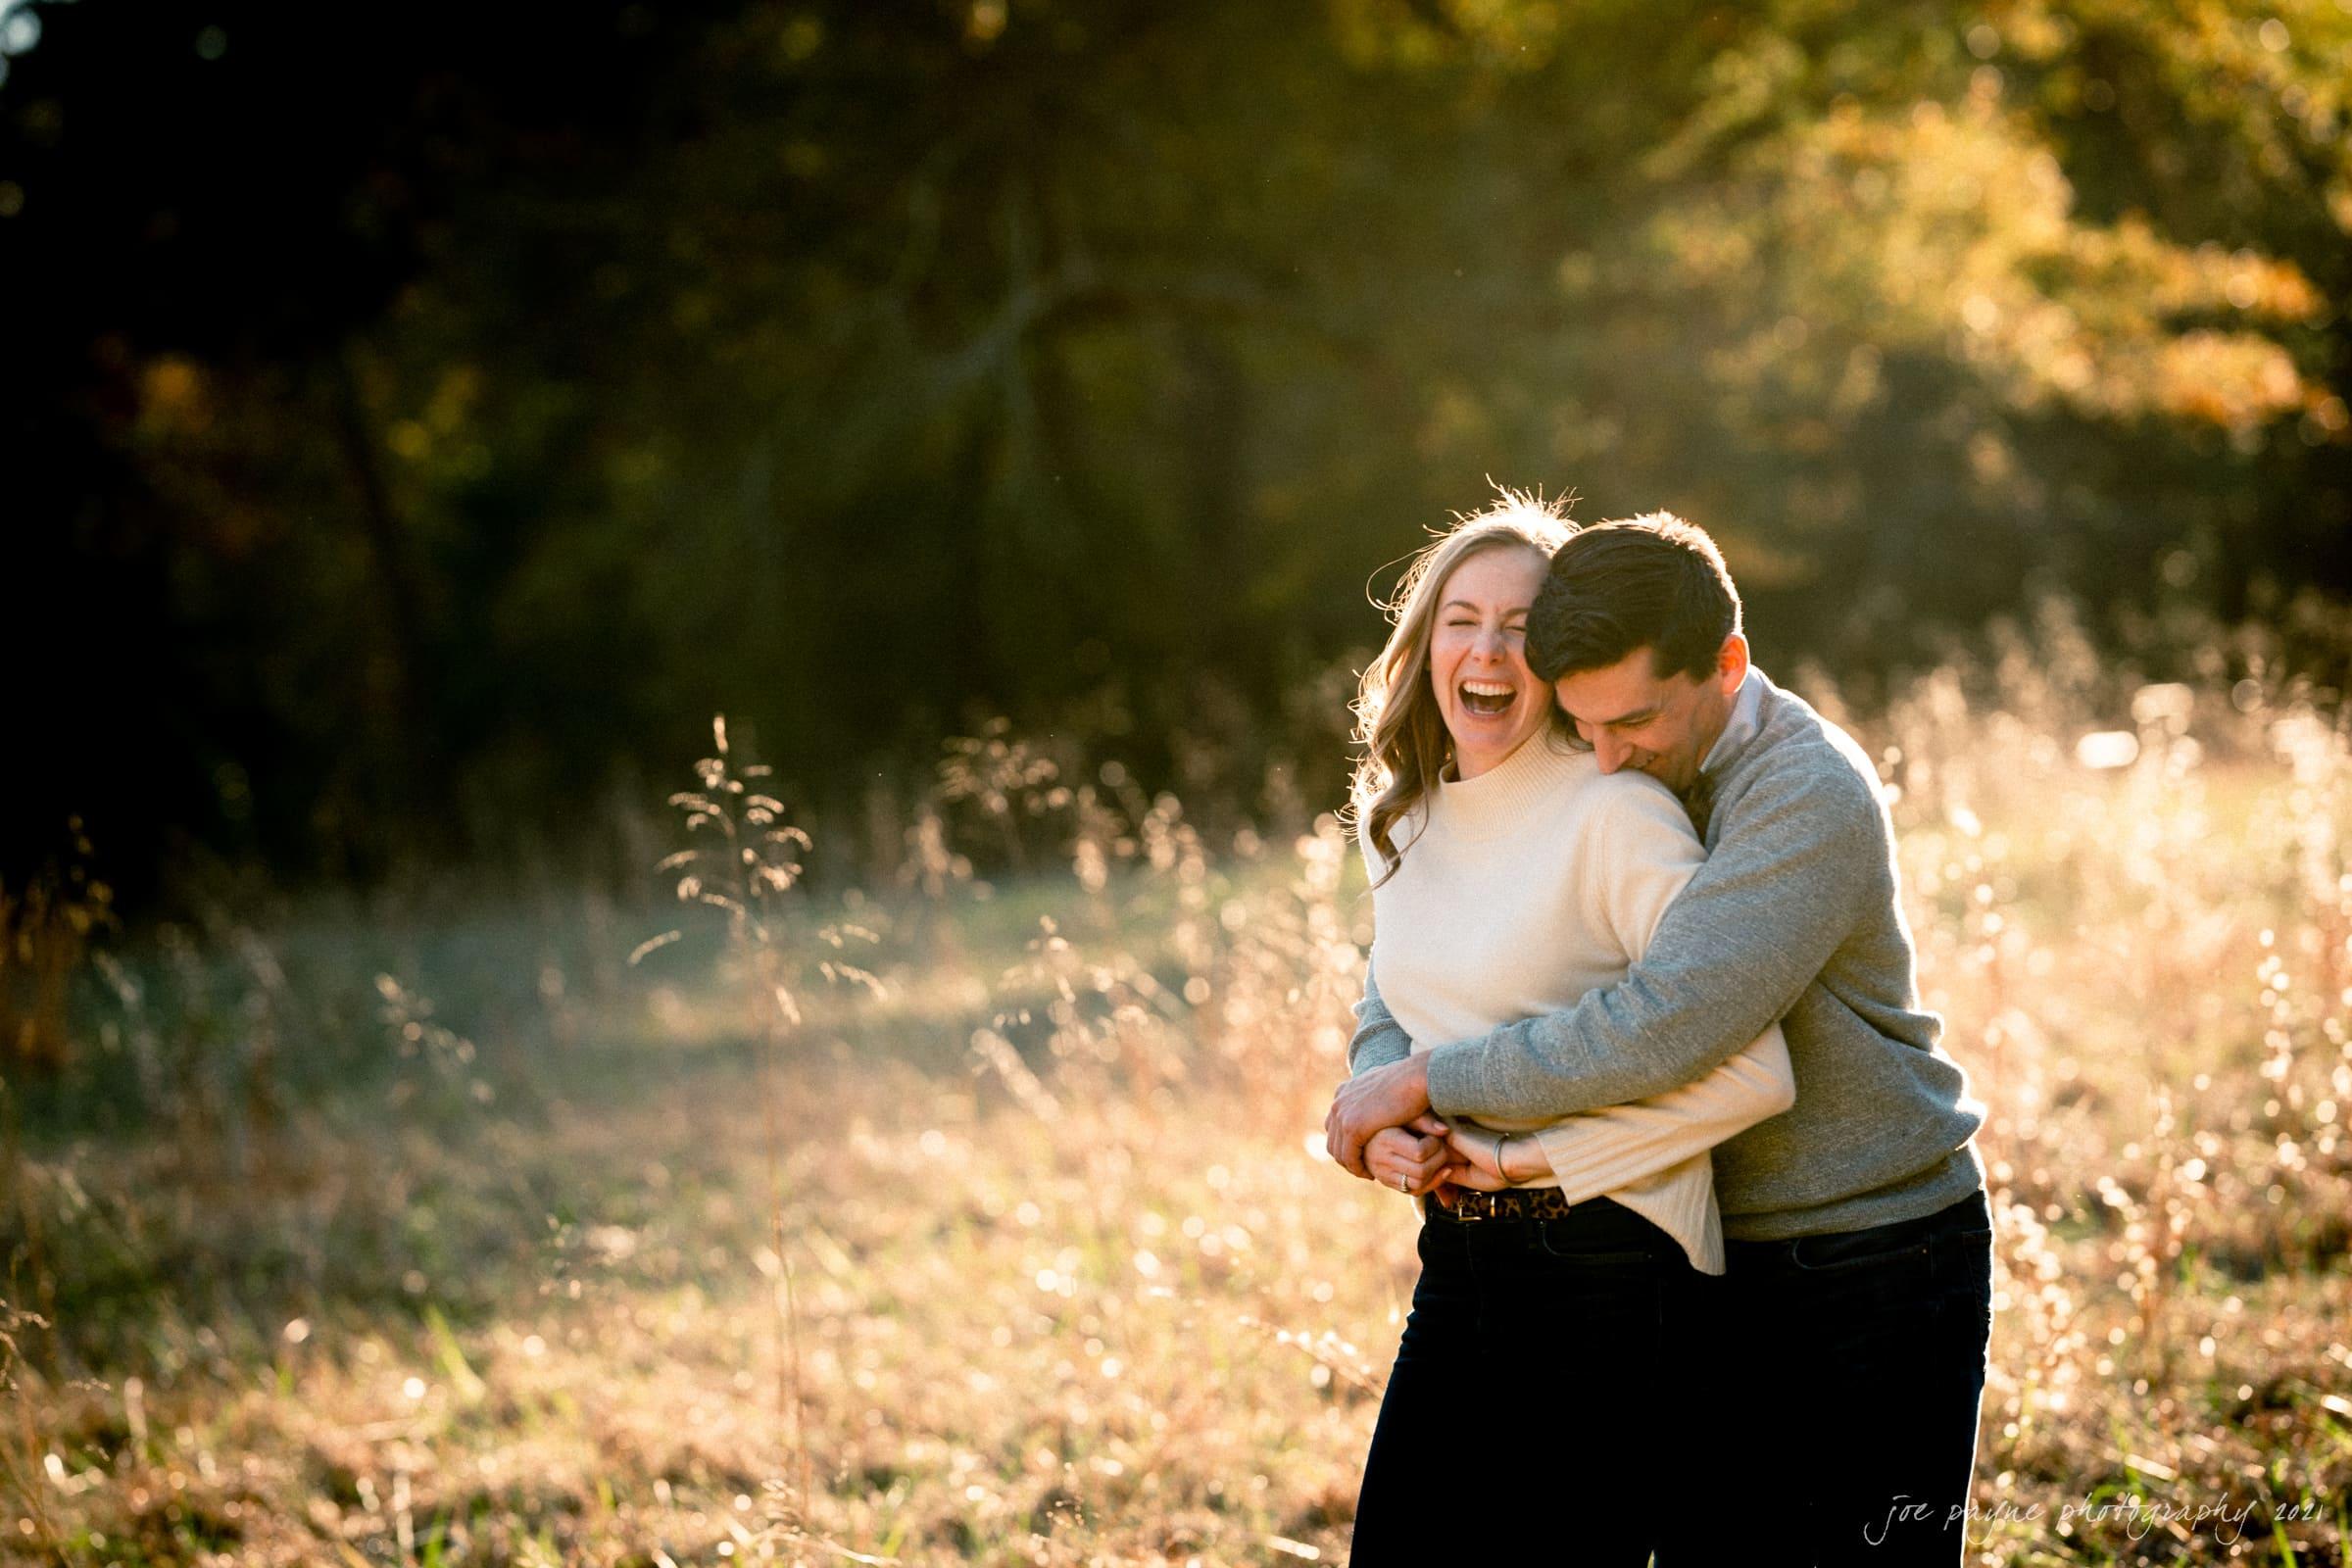 pinehurst engagement photography session lindsey brendan 11